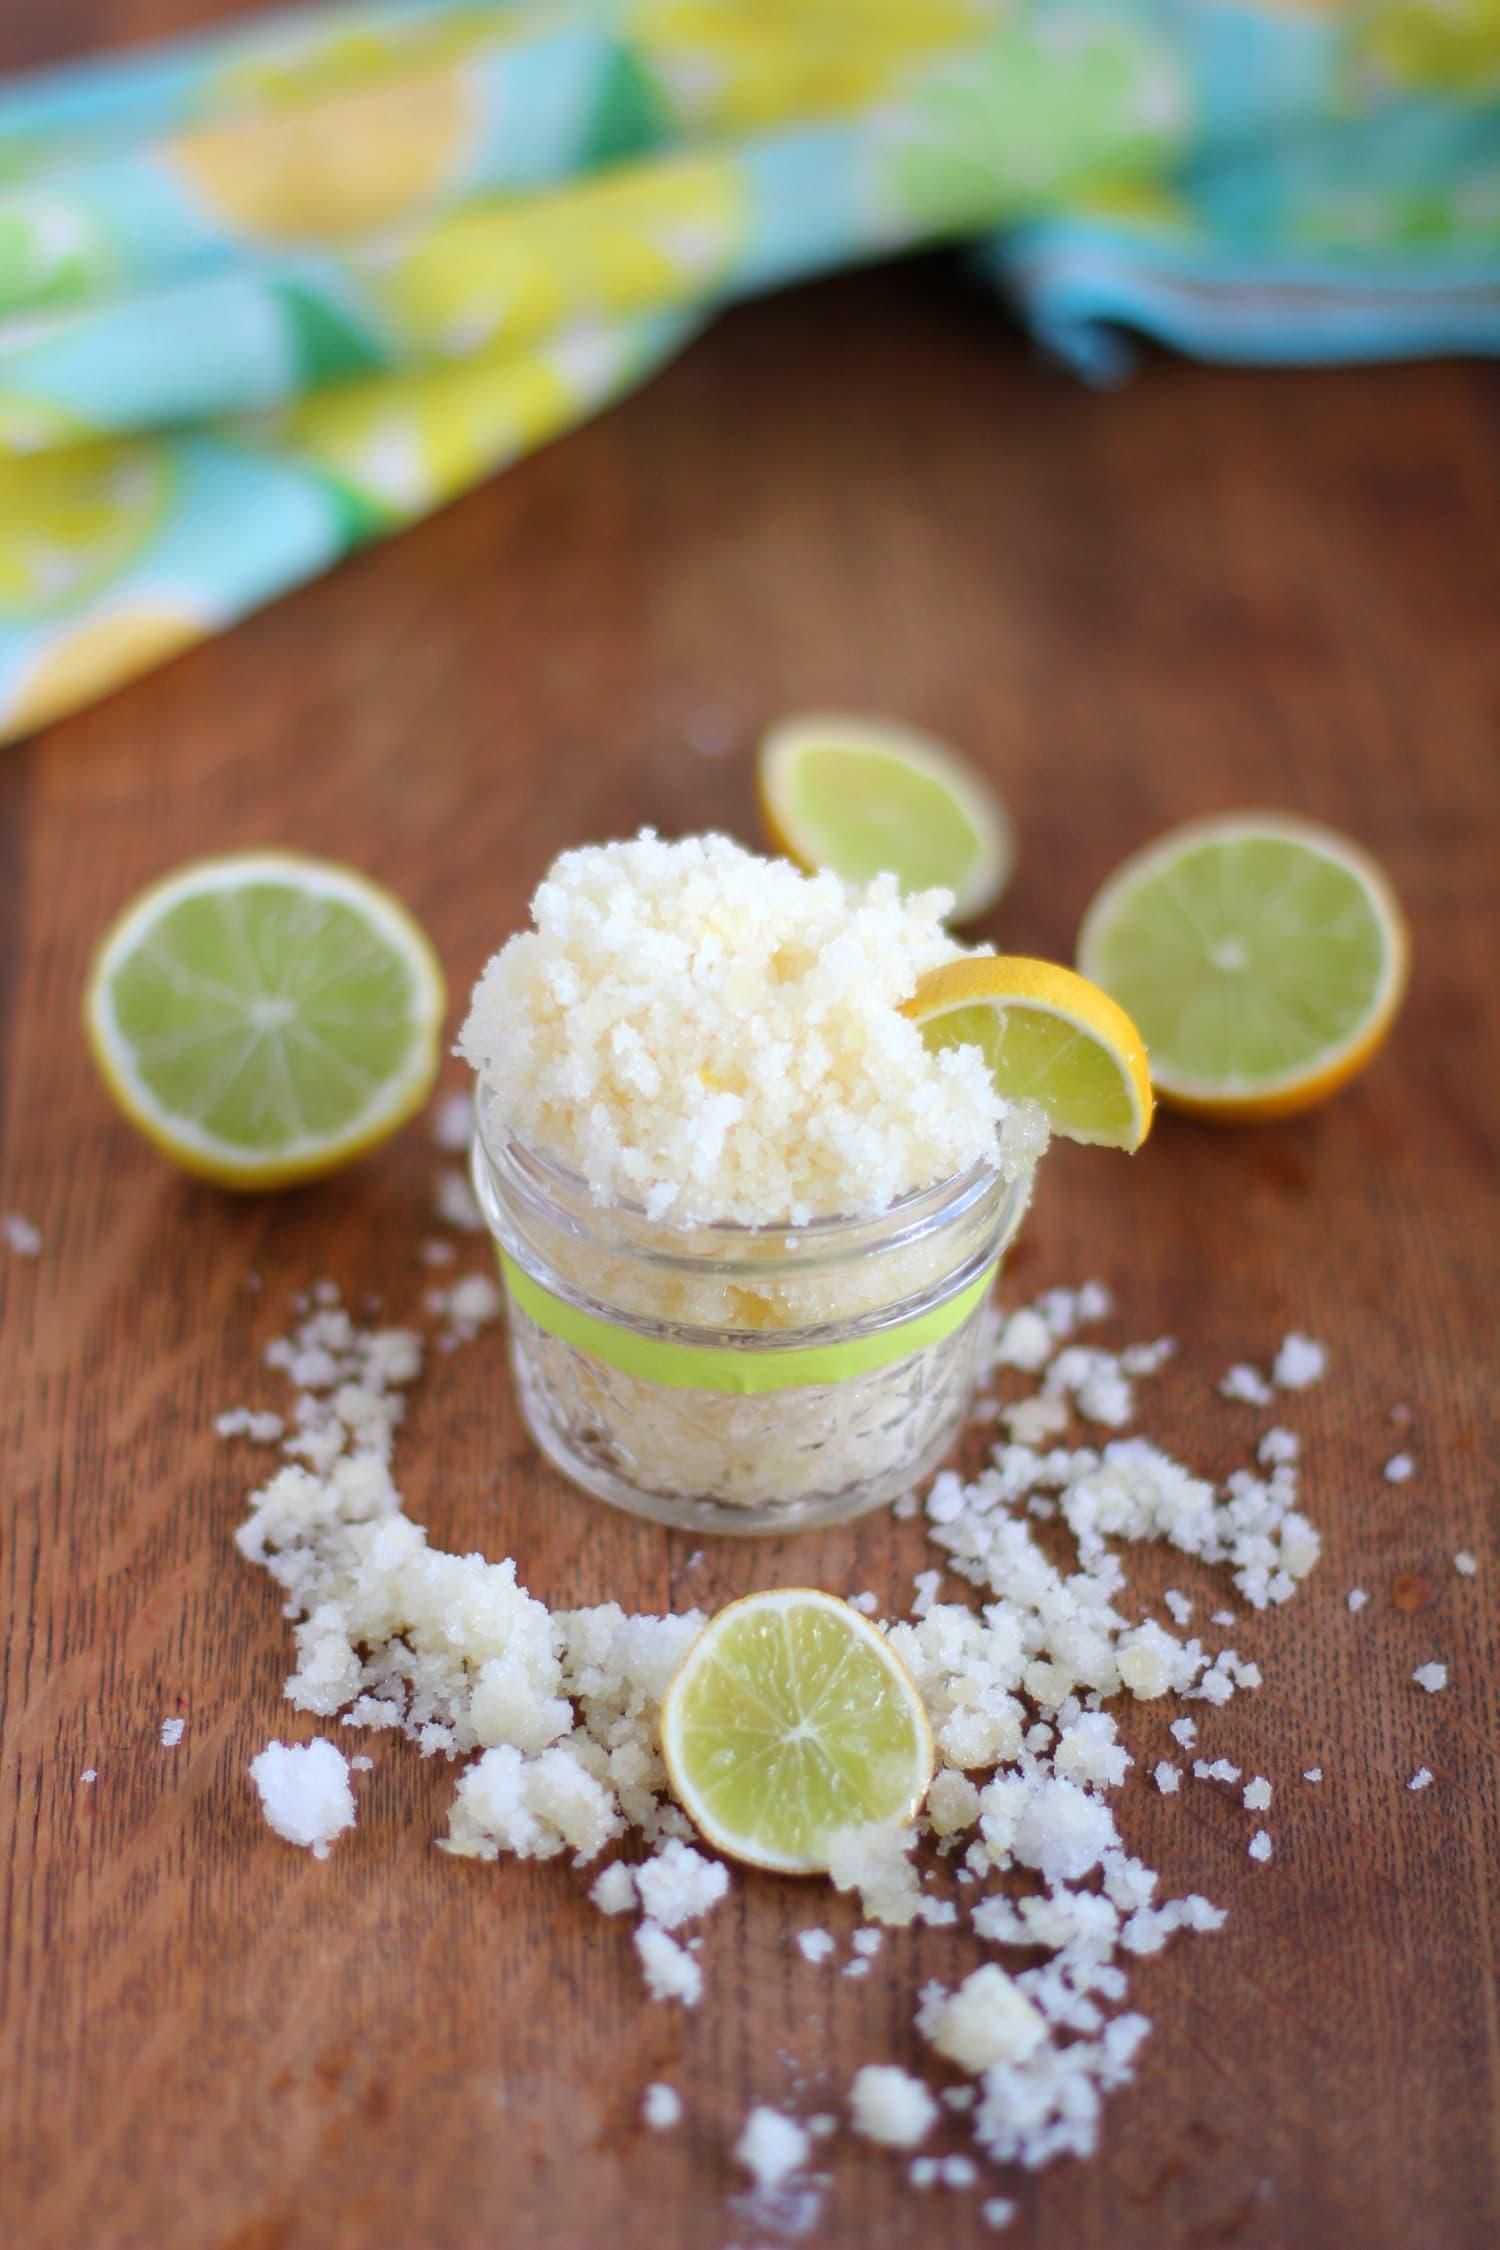 How to make coconut lime sugar scrub